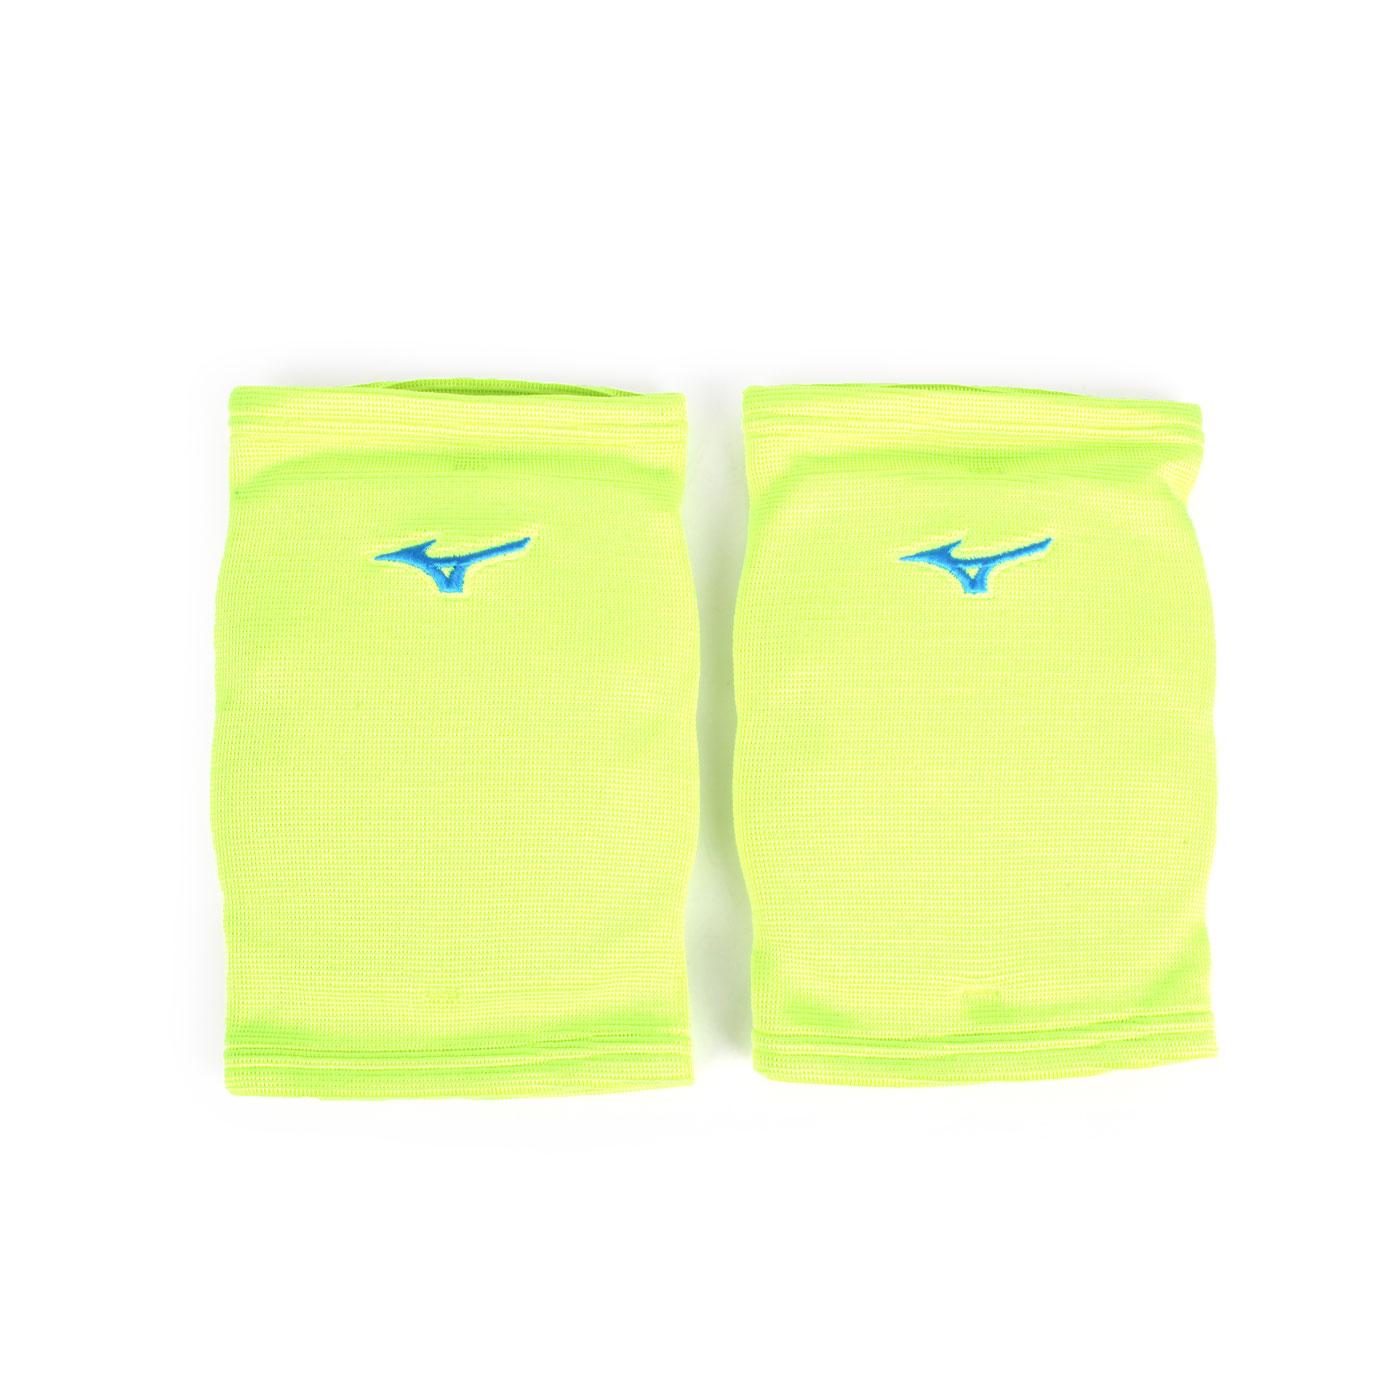 MIZUNO 成人用護膝 V2TY800609 - 螢光綠水藍